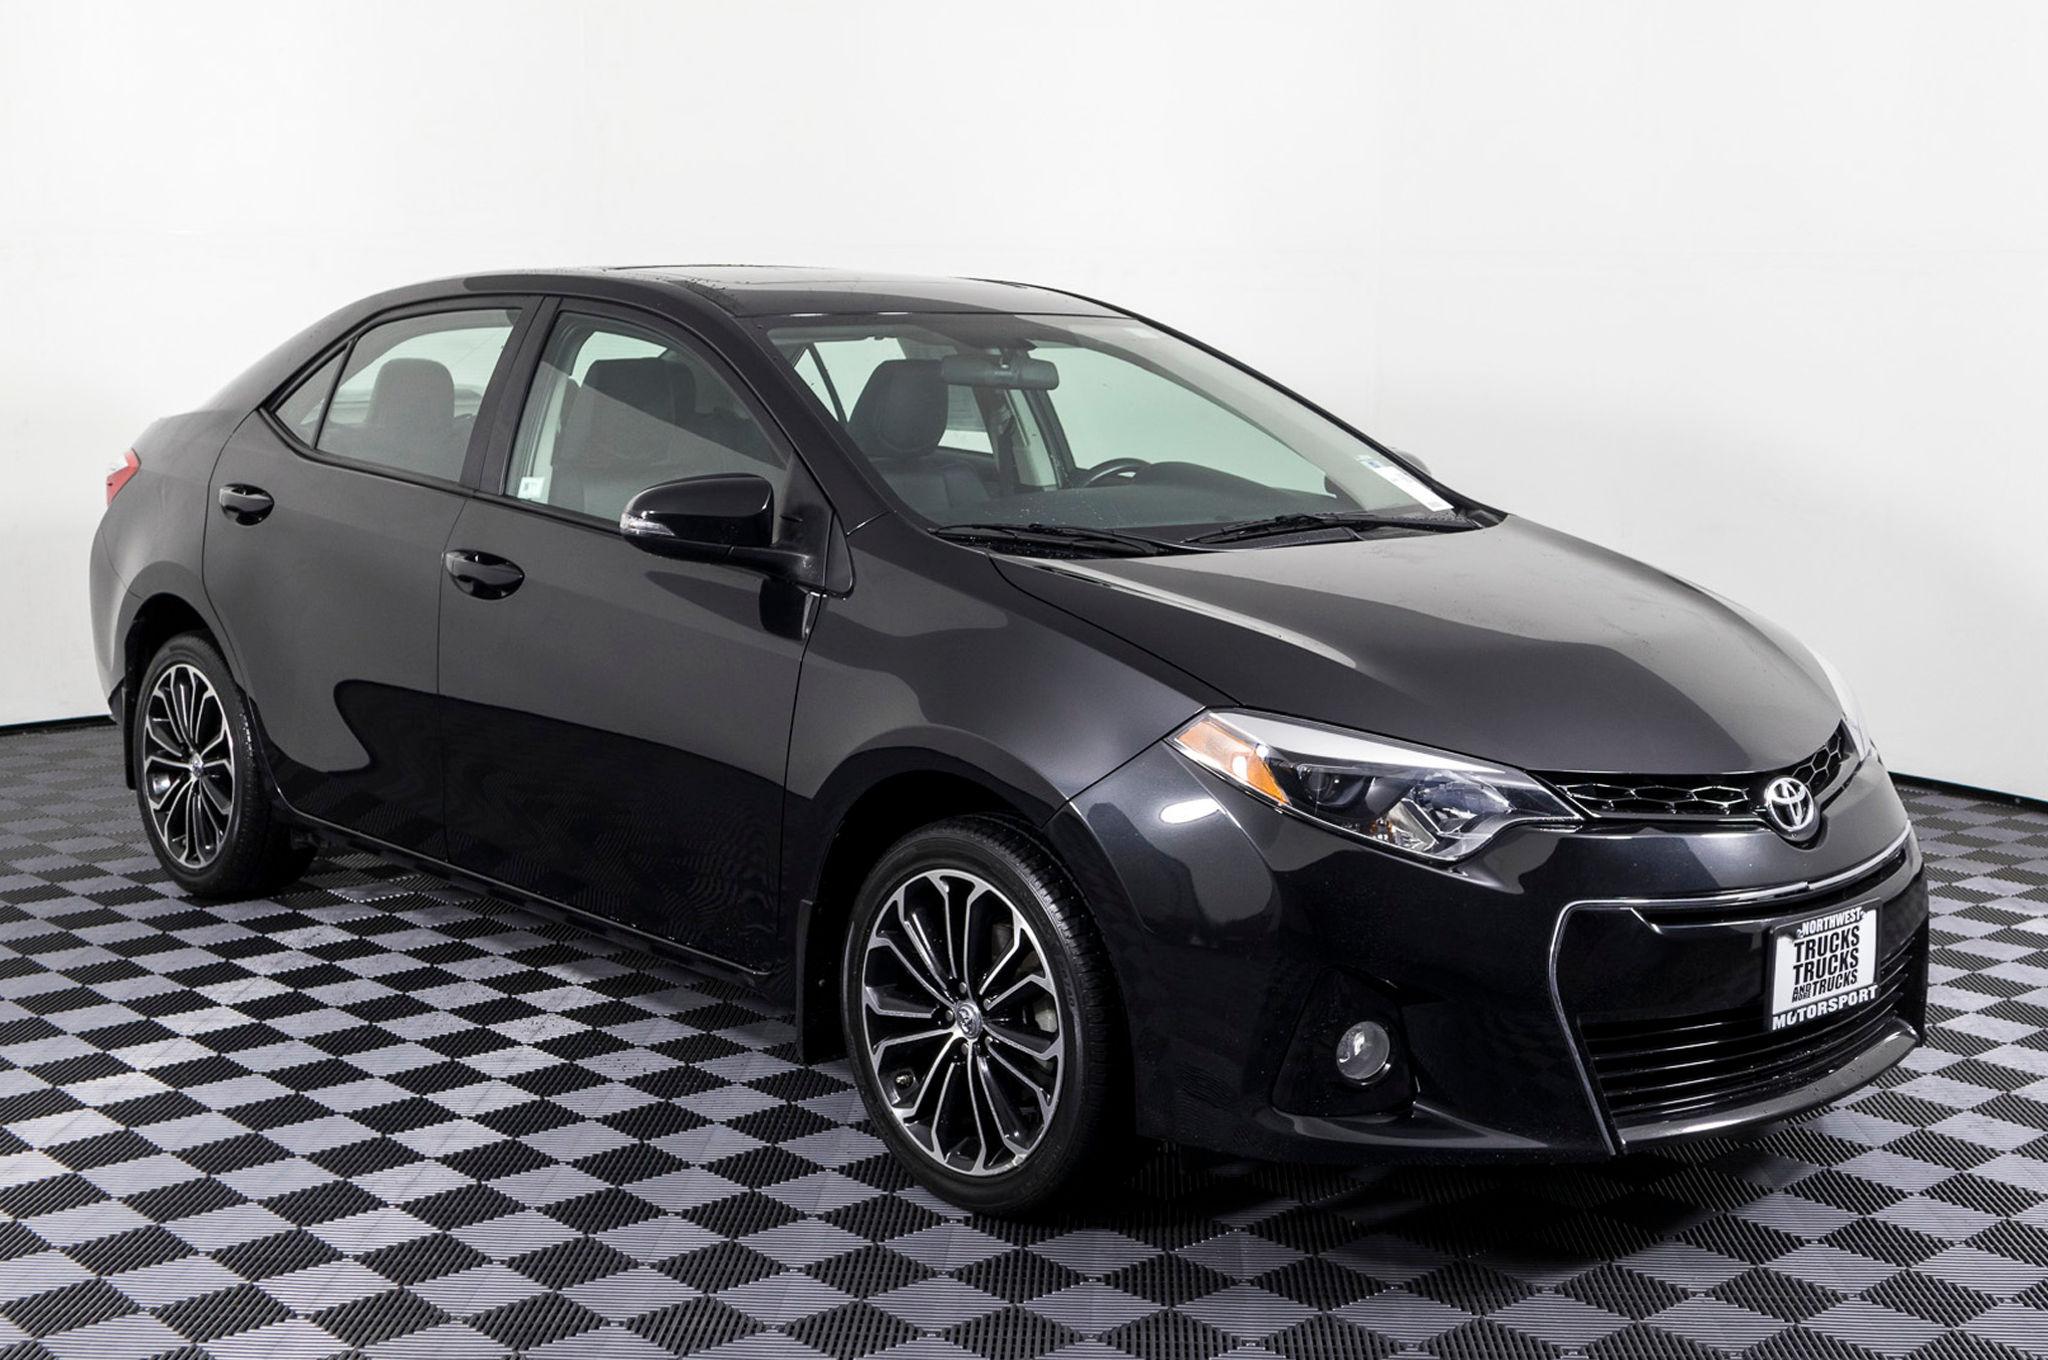 Used 2014 Toyota Corolla S Plus FWD Sedan For Sale